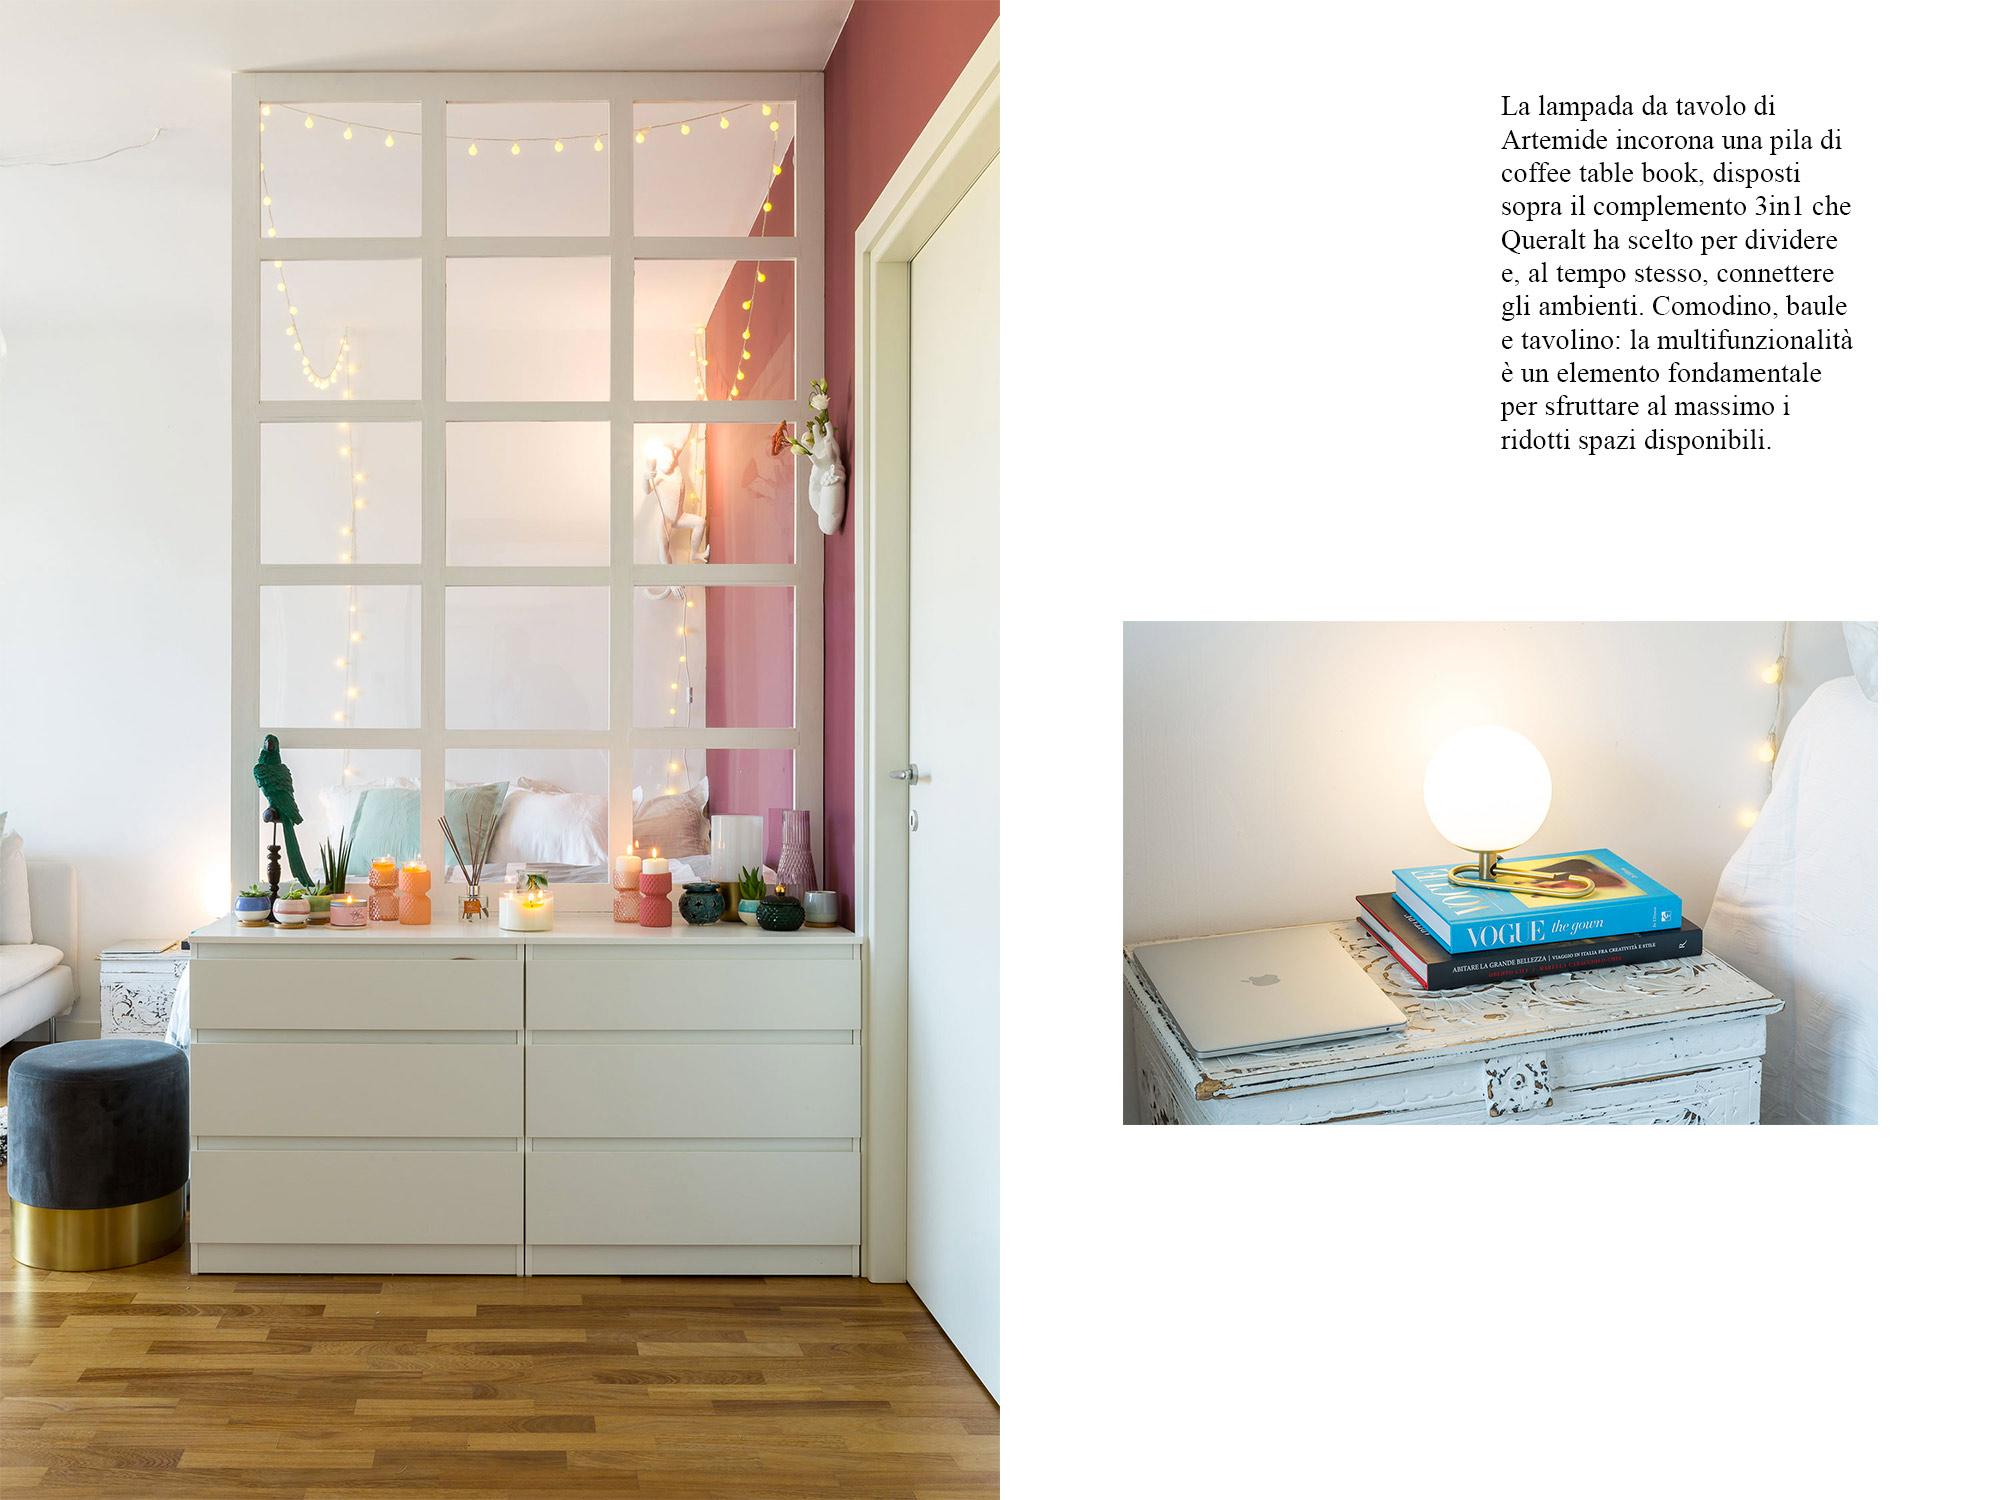 Queralt Badalamenti, Casa Piccola, Casa, Milano, Stile, Scandi, Attrice